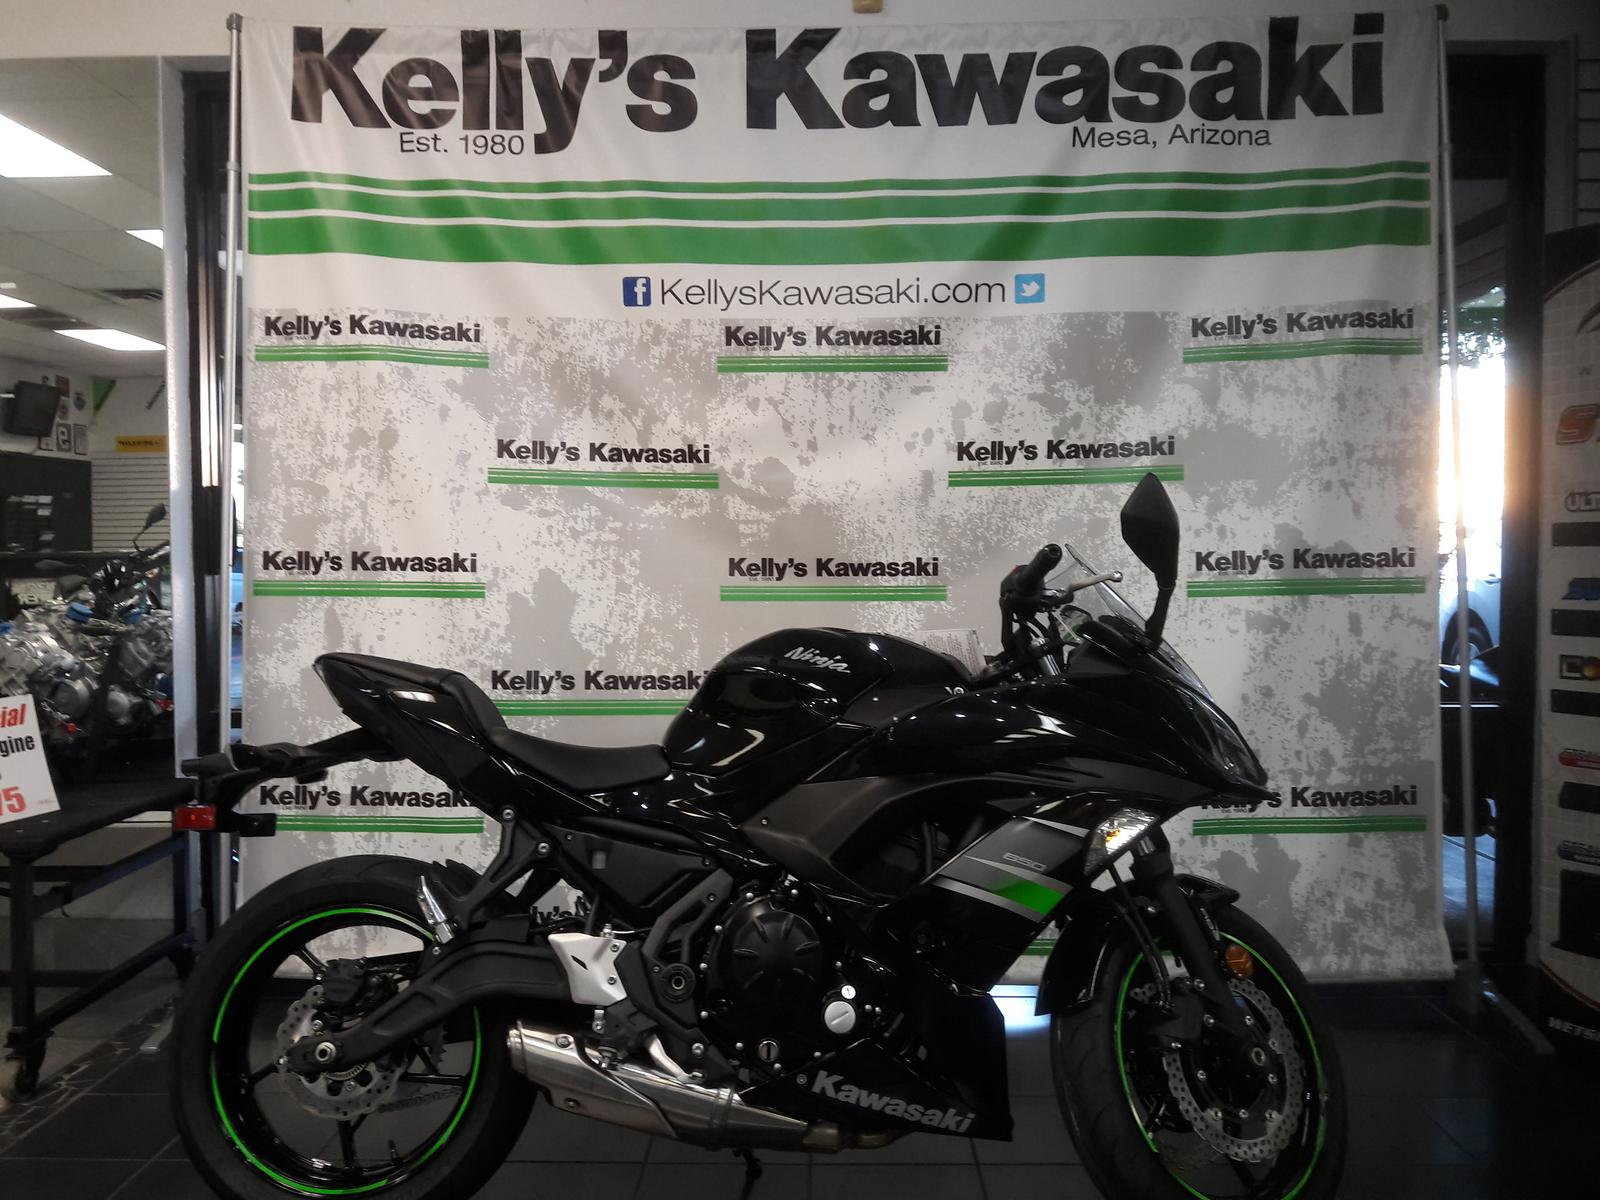 2019 Kawasaki Ninja 650 Abs For Sale In Mesa Az Kellys Kawasaki